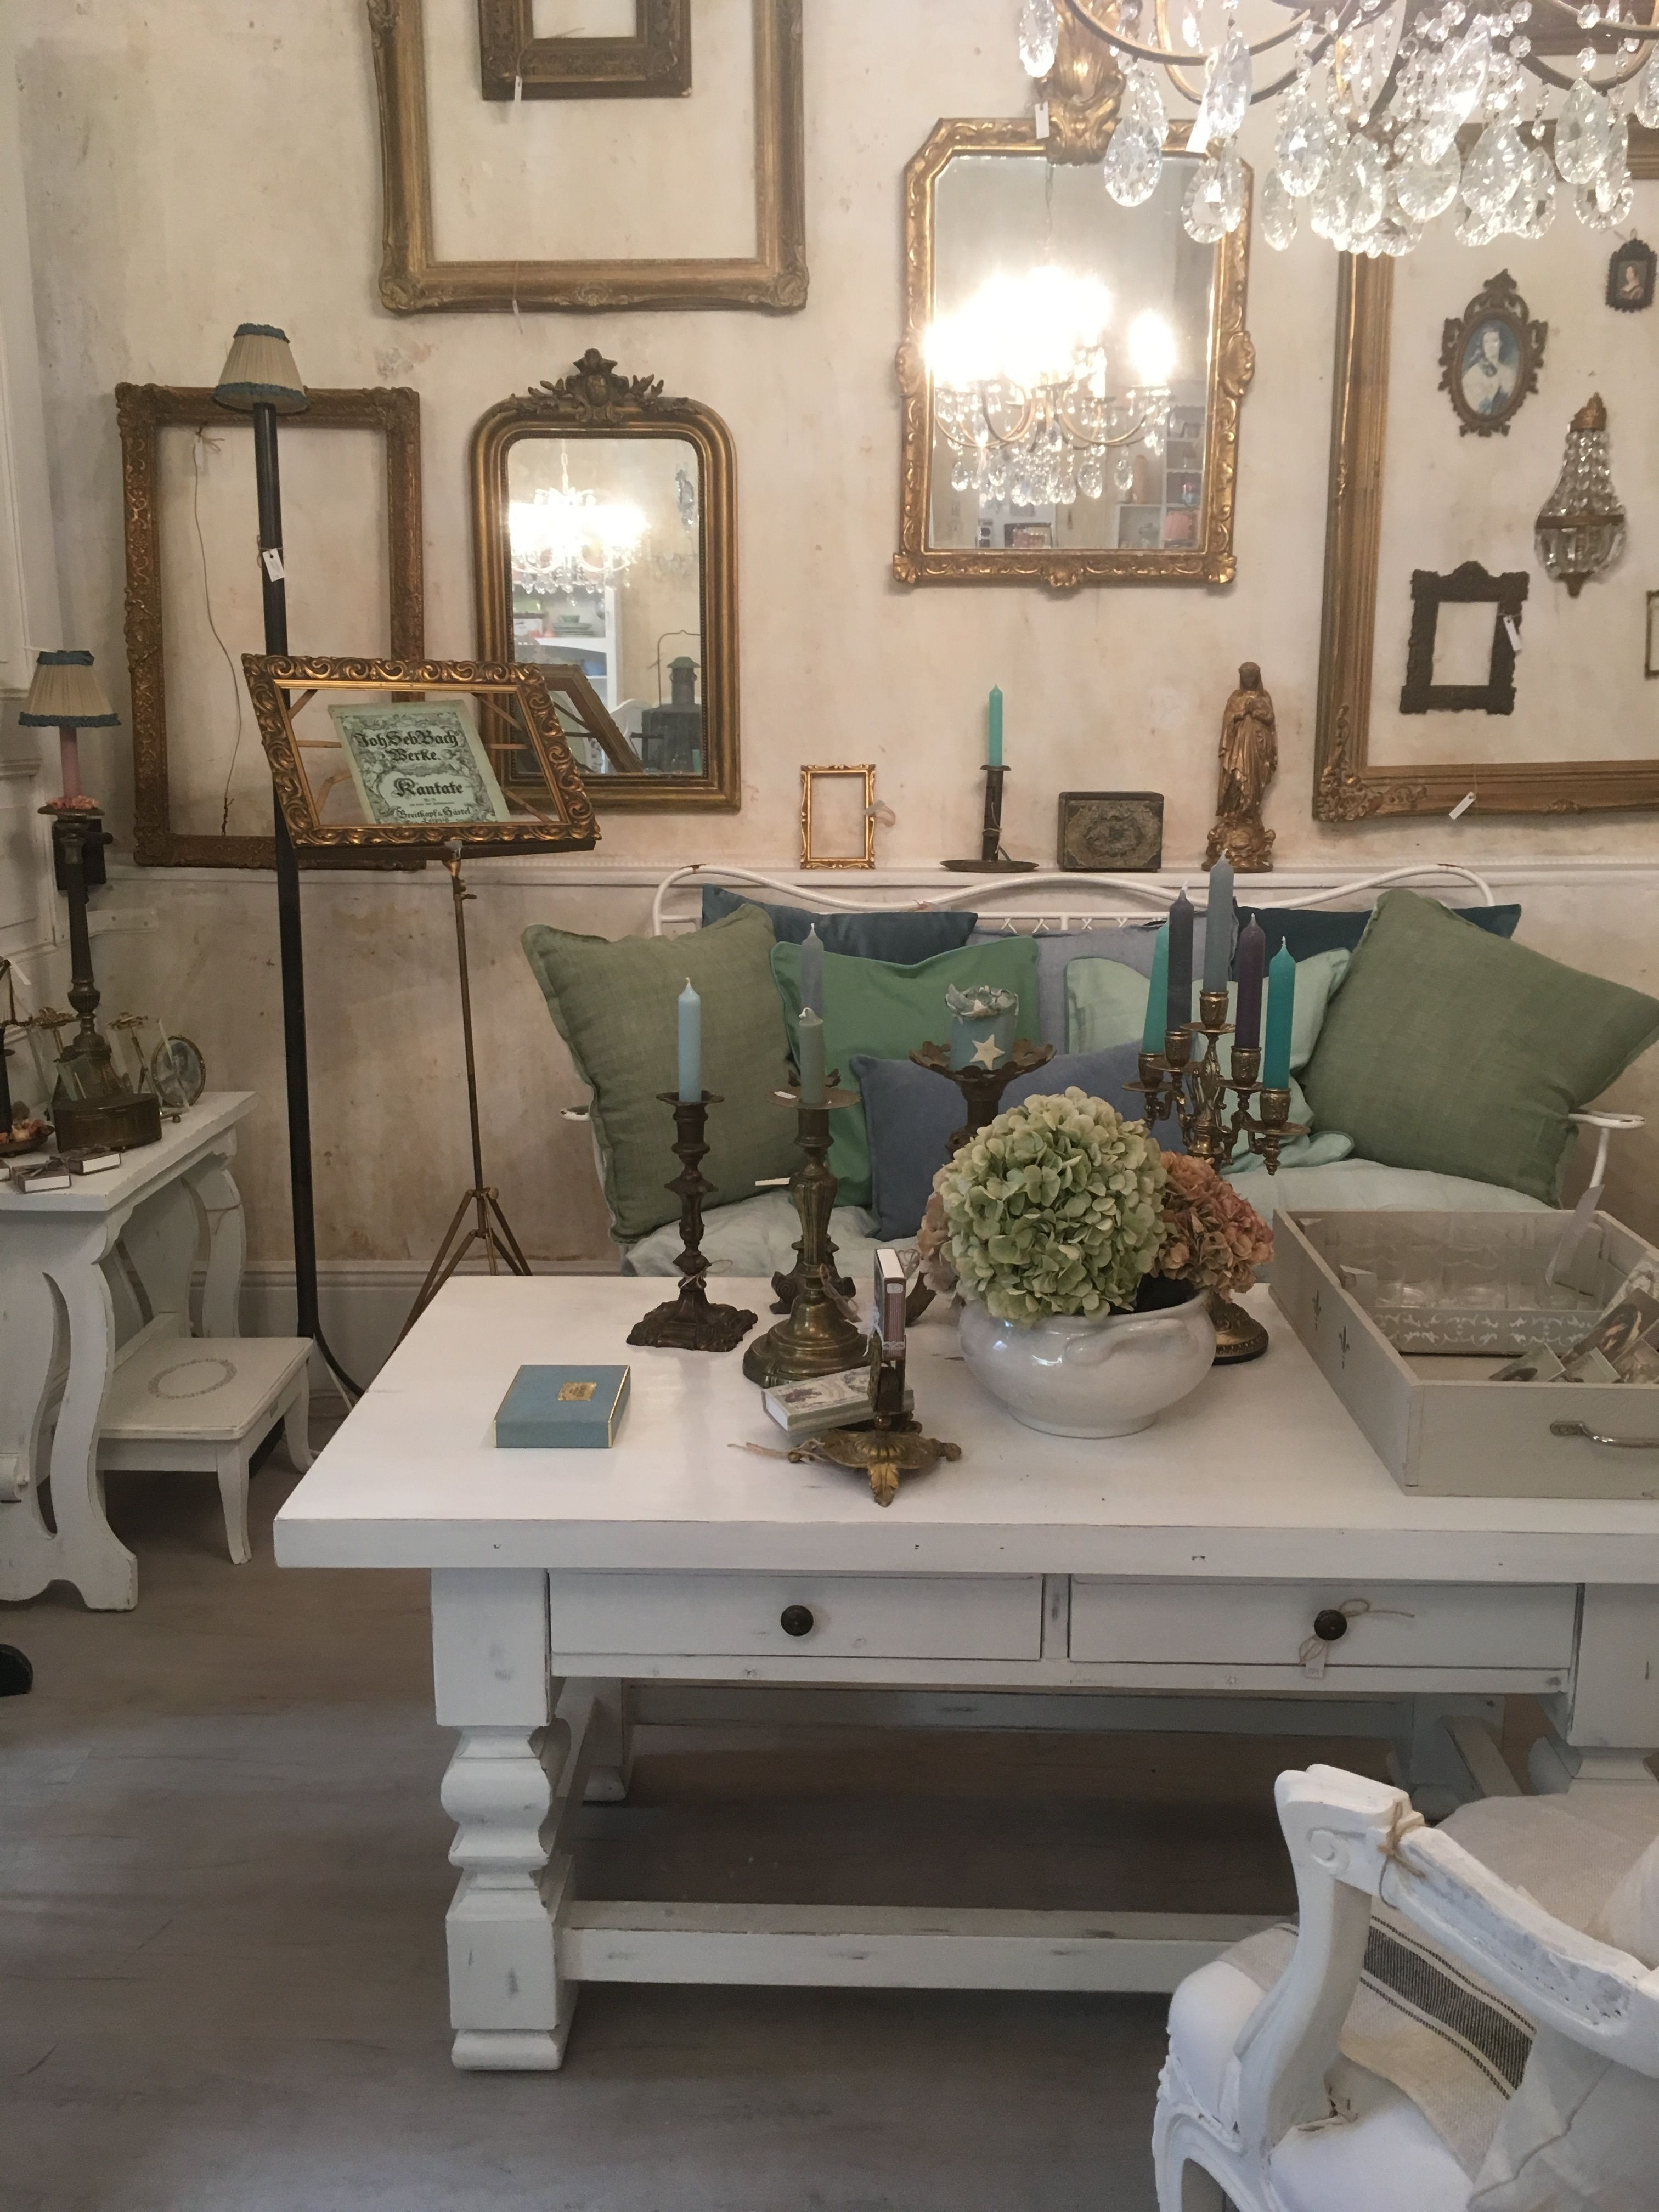 shabby chic furniture living room. Vintage Und Shabby Chic Bei UNIKATUM Luzern · Living RoomShabby FurnitureLiving Furniture Room C